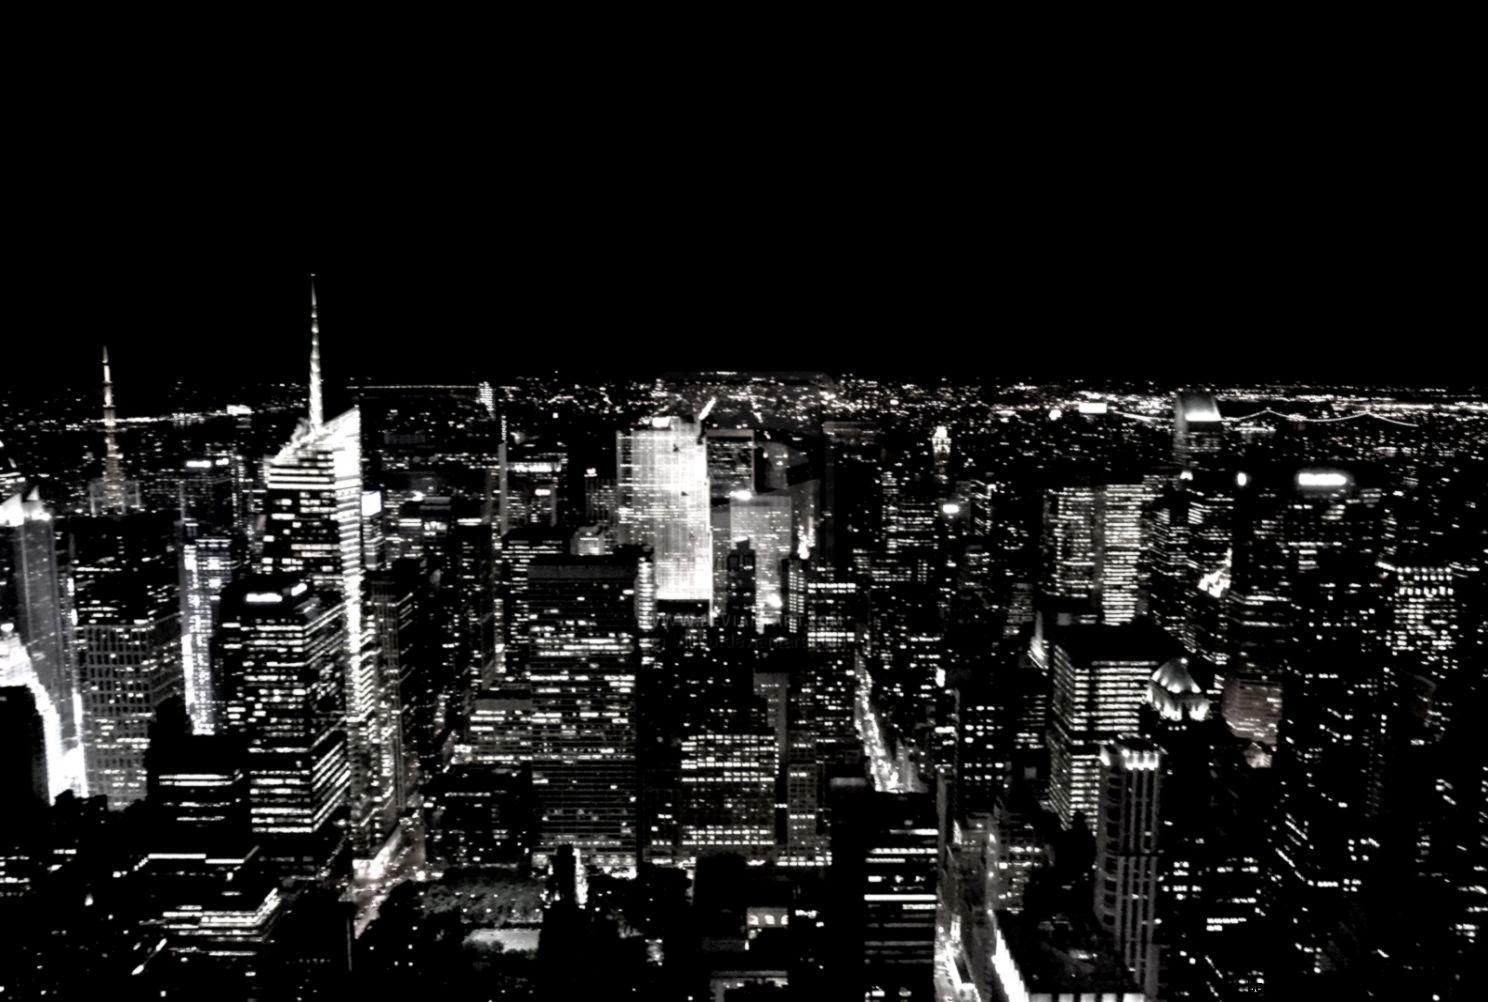 Photography Wallpaper City Lights Best HD Wallpapers 1488x1002